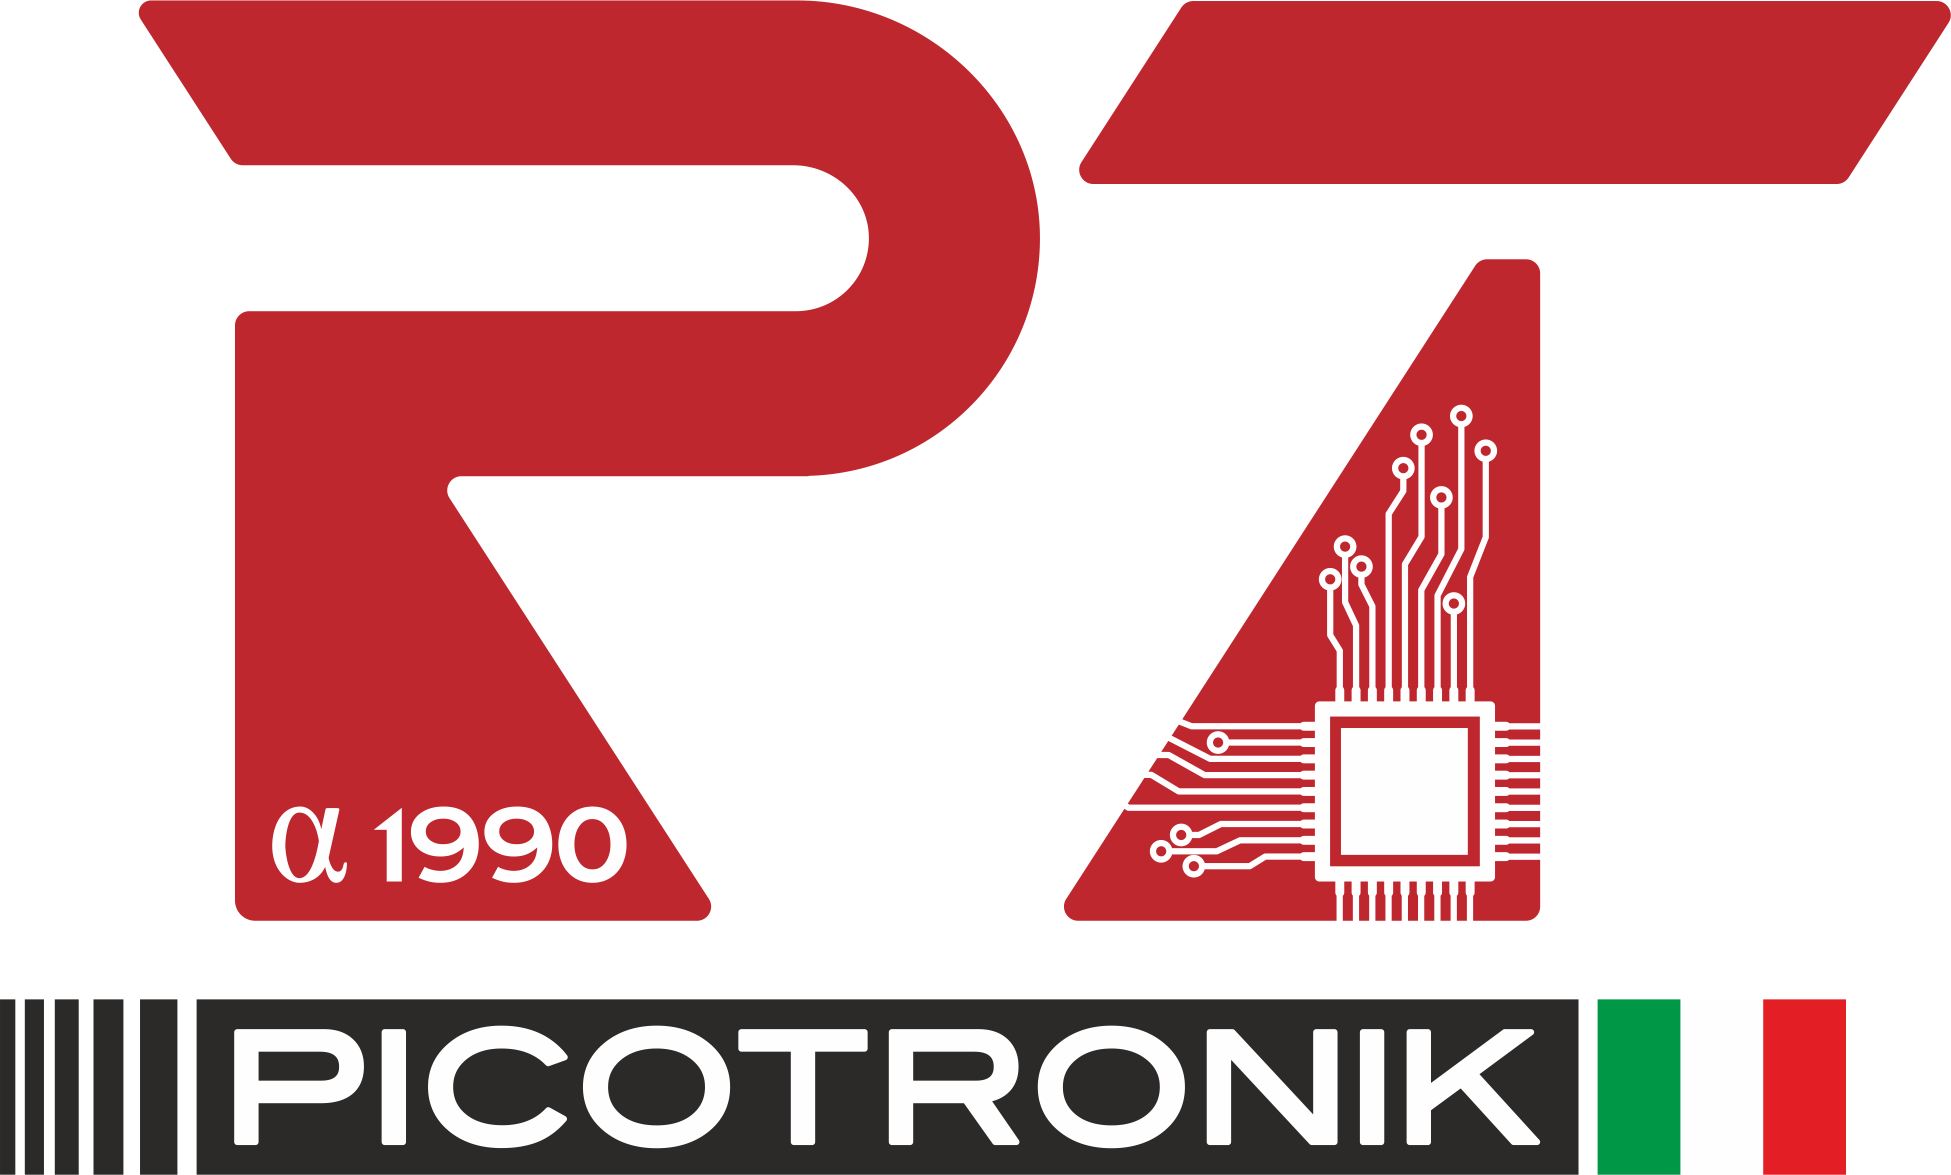 Picotronik